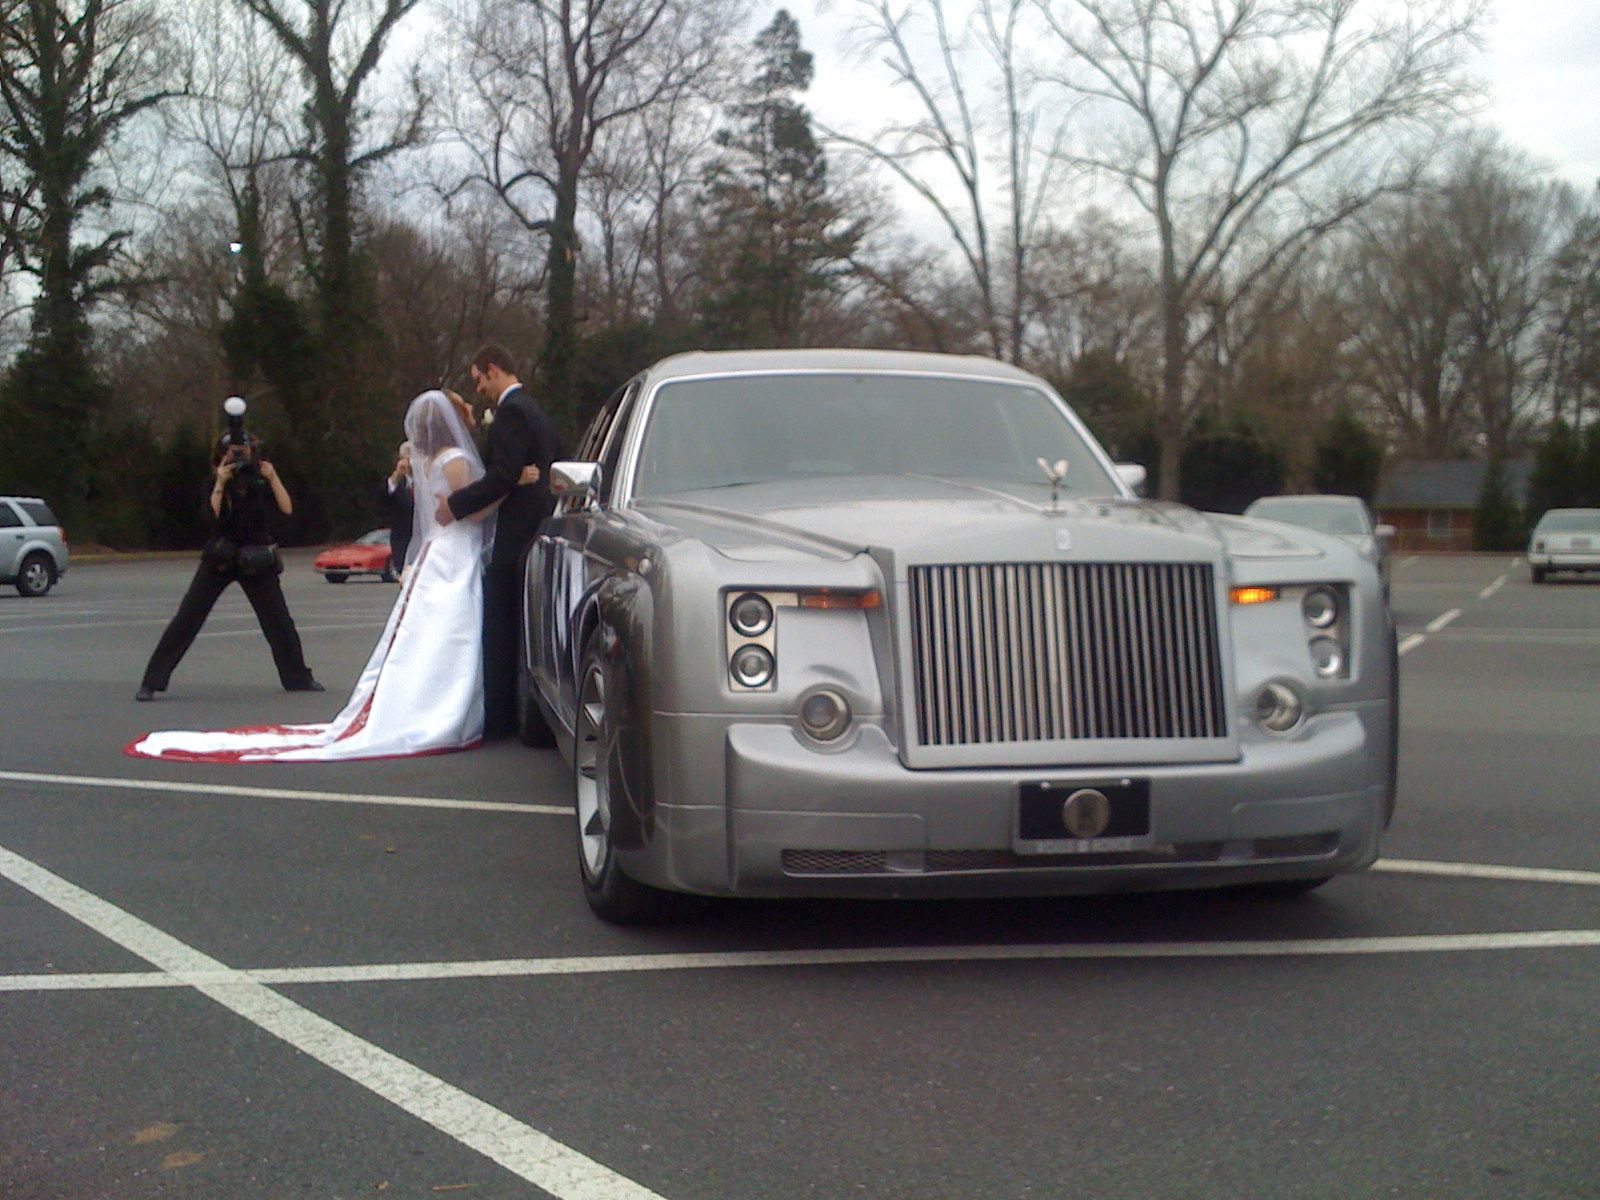 Merveilleux Car Rolls Royce Phantom Limo